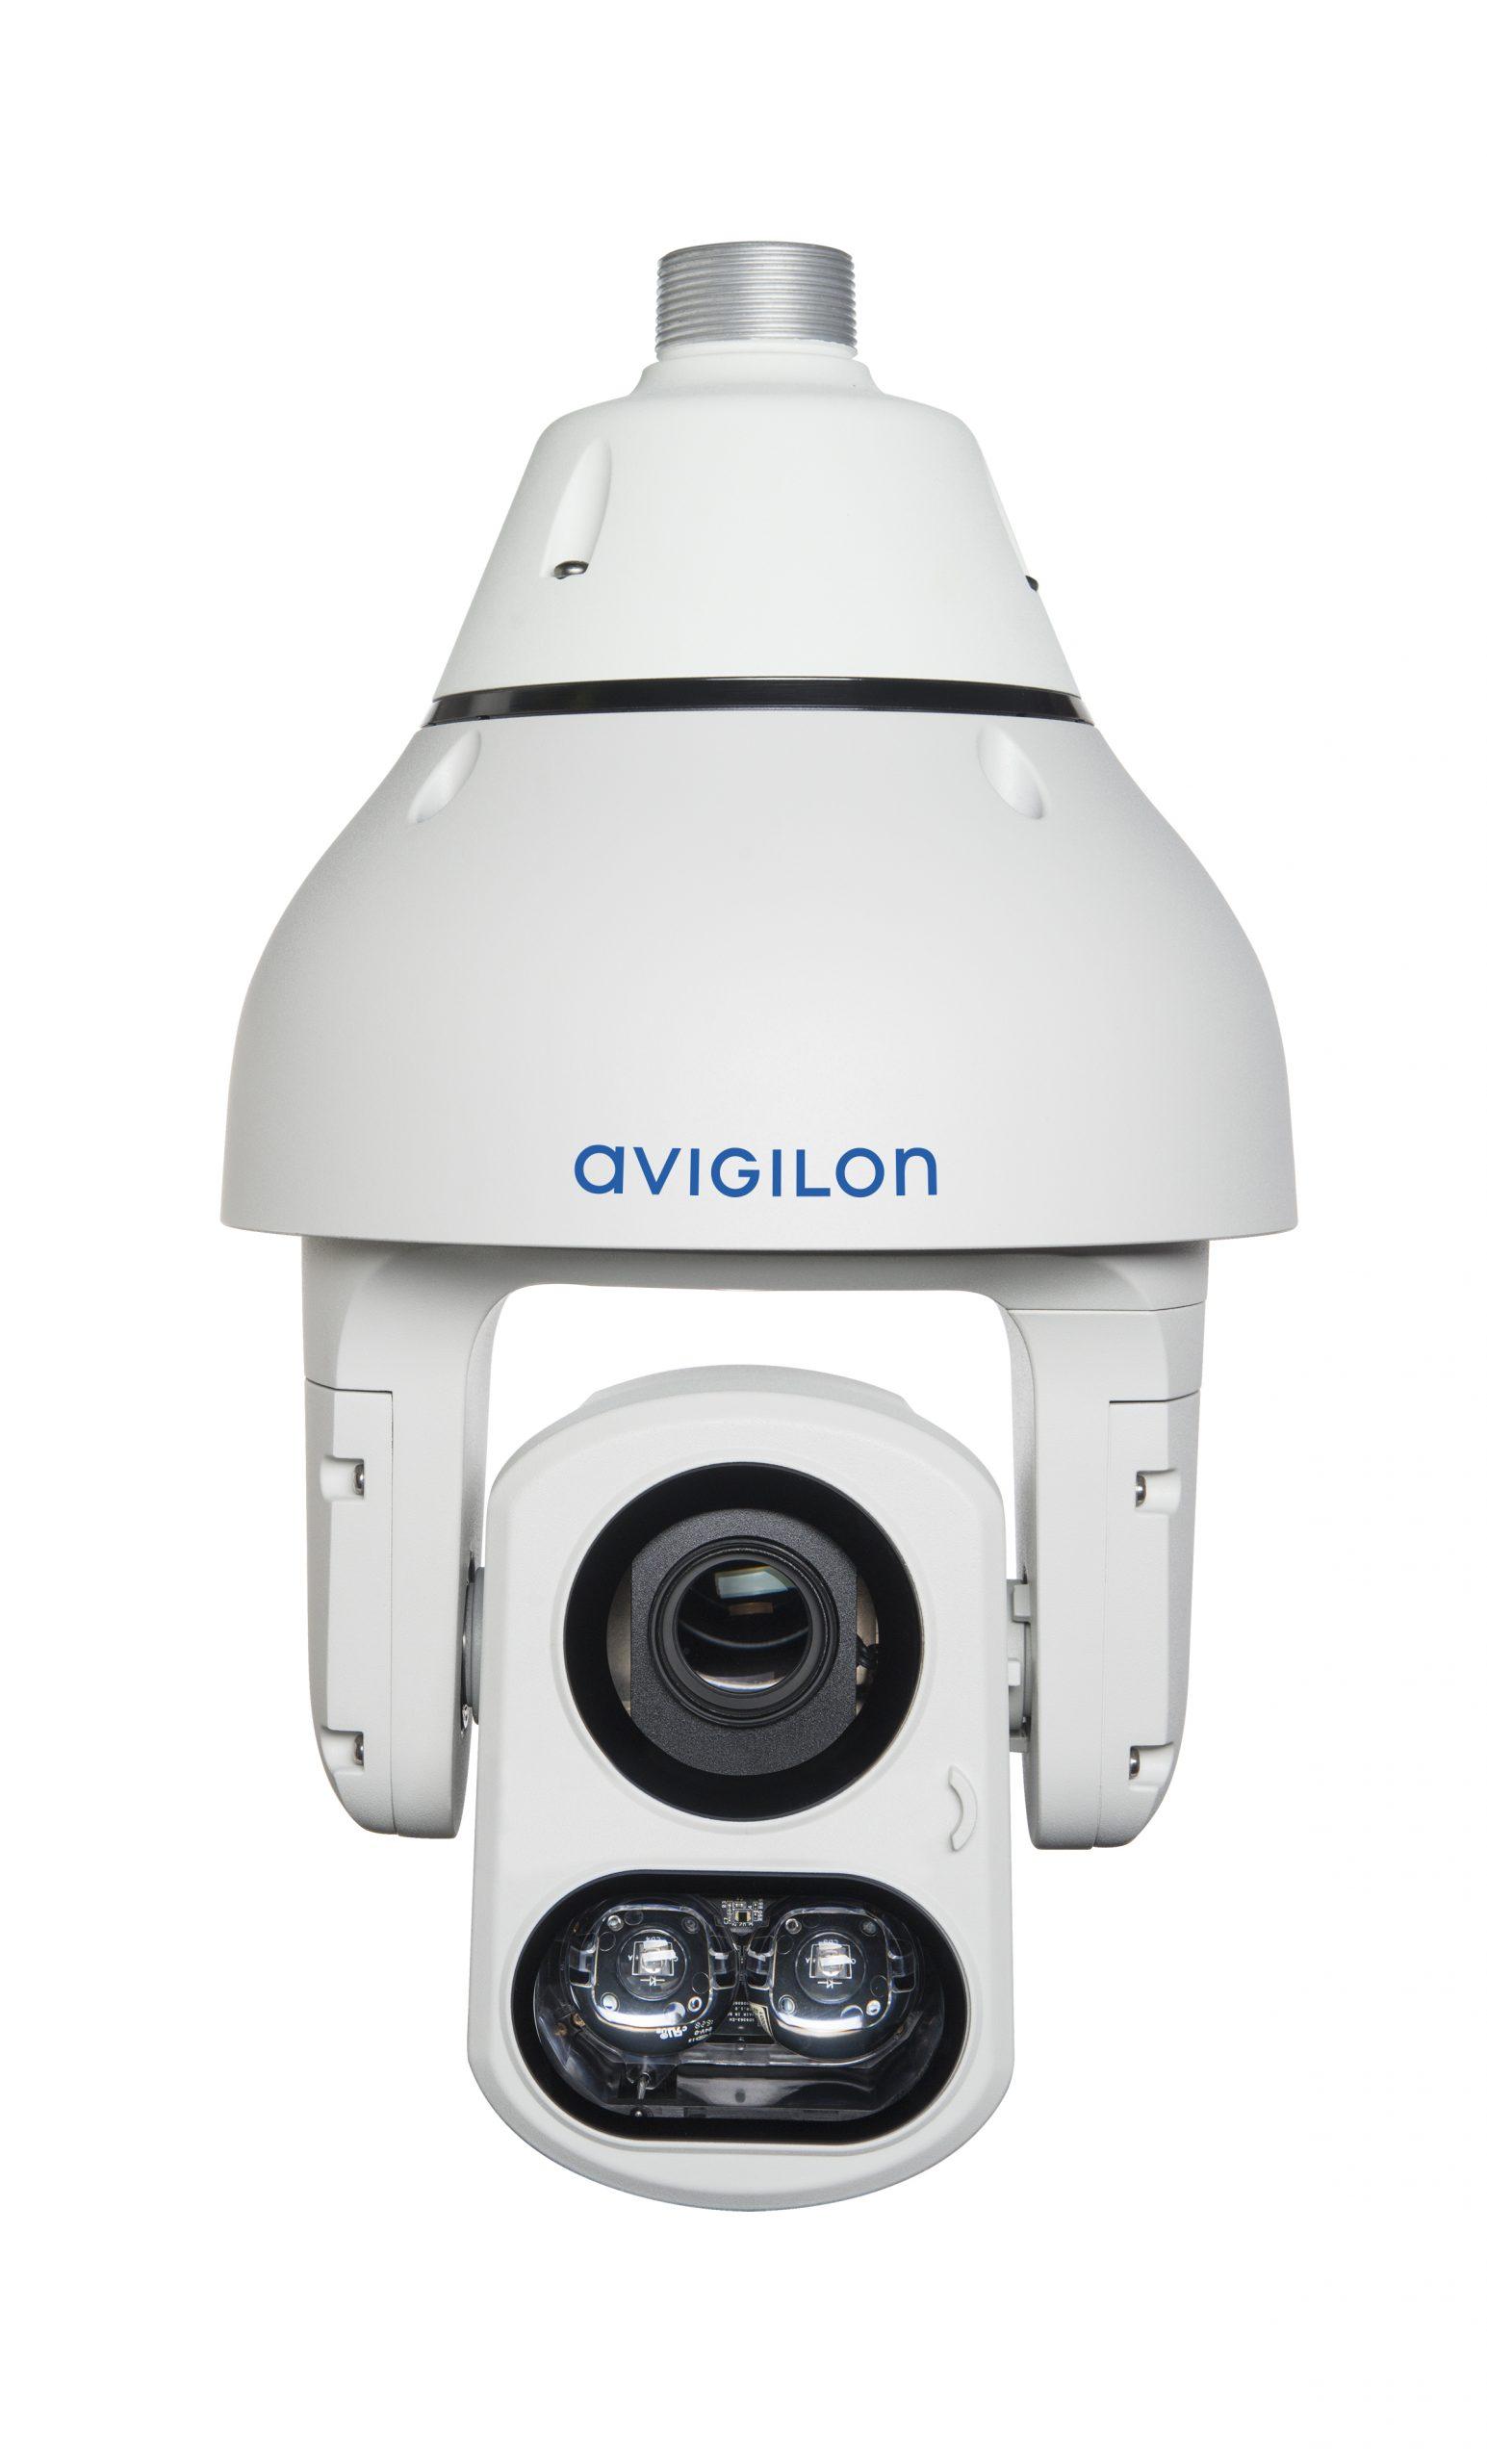 Avigilon PTZ Camera